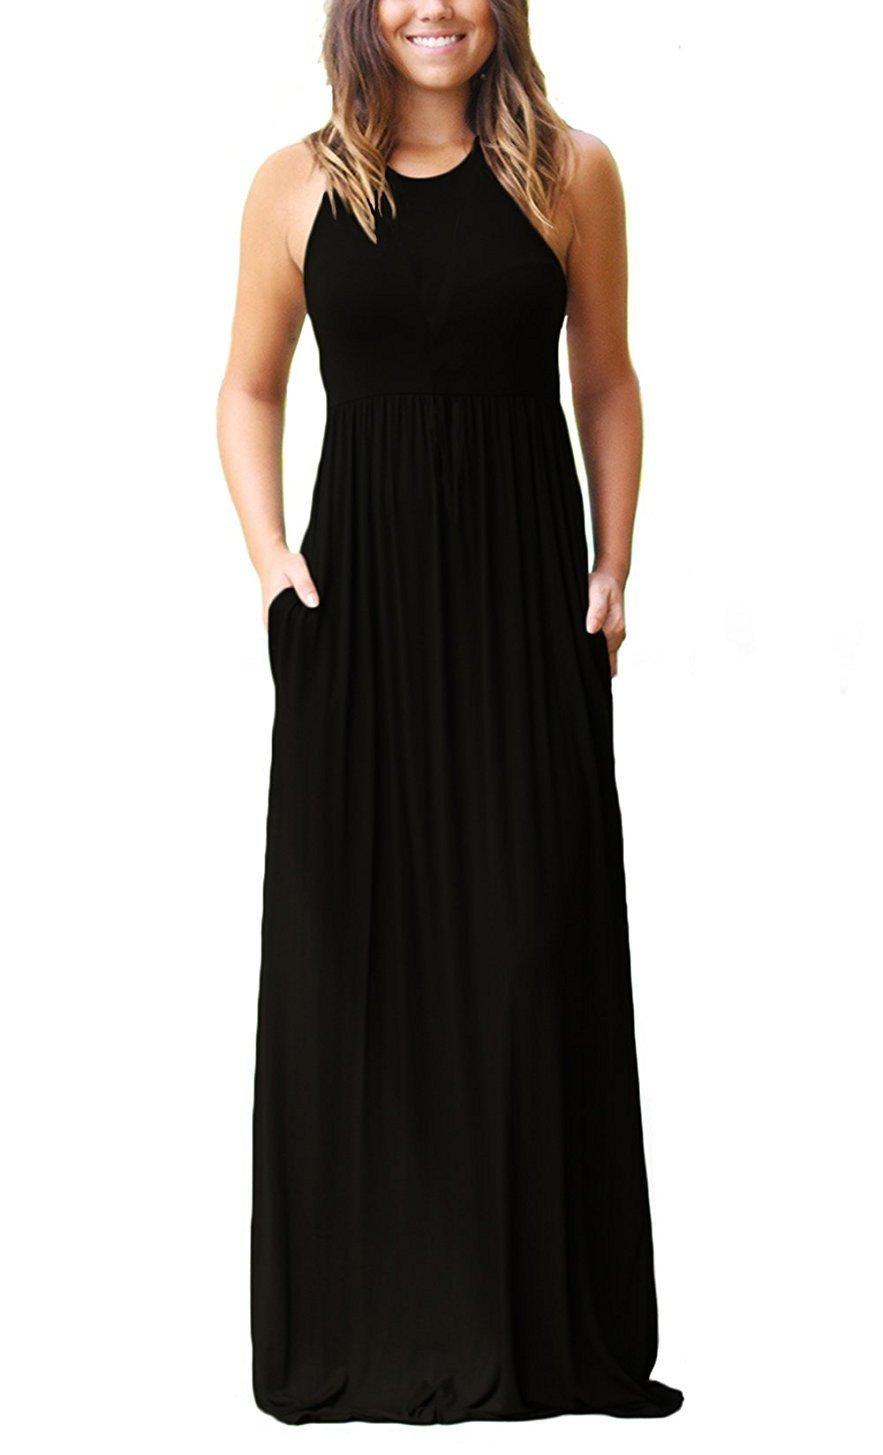 Euovmy Women's Sleeveless Dress Casual Plain Loose Summer Long Maxi Dresses with Pockets Black